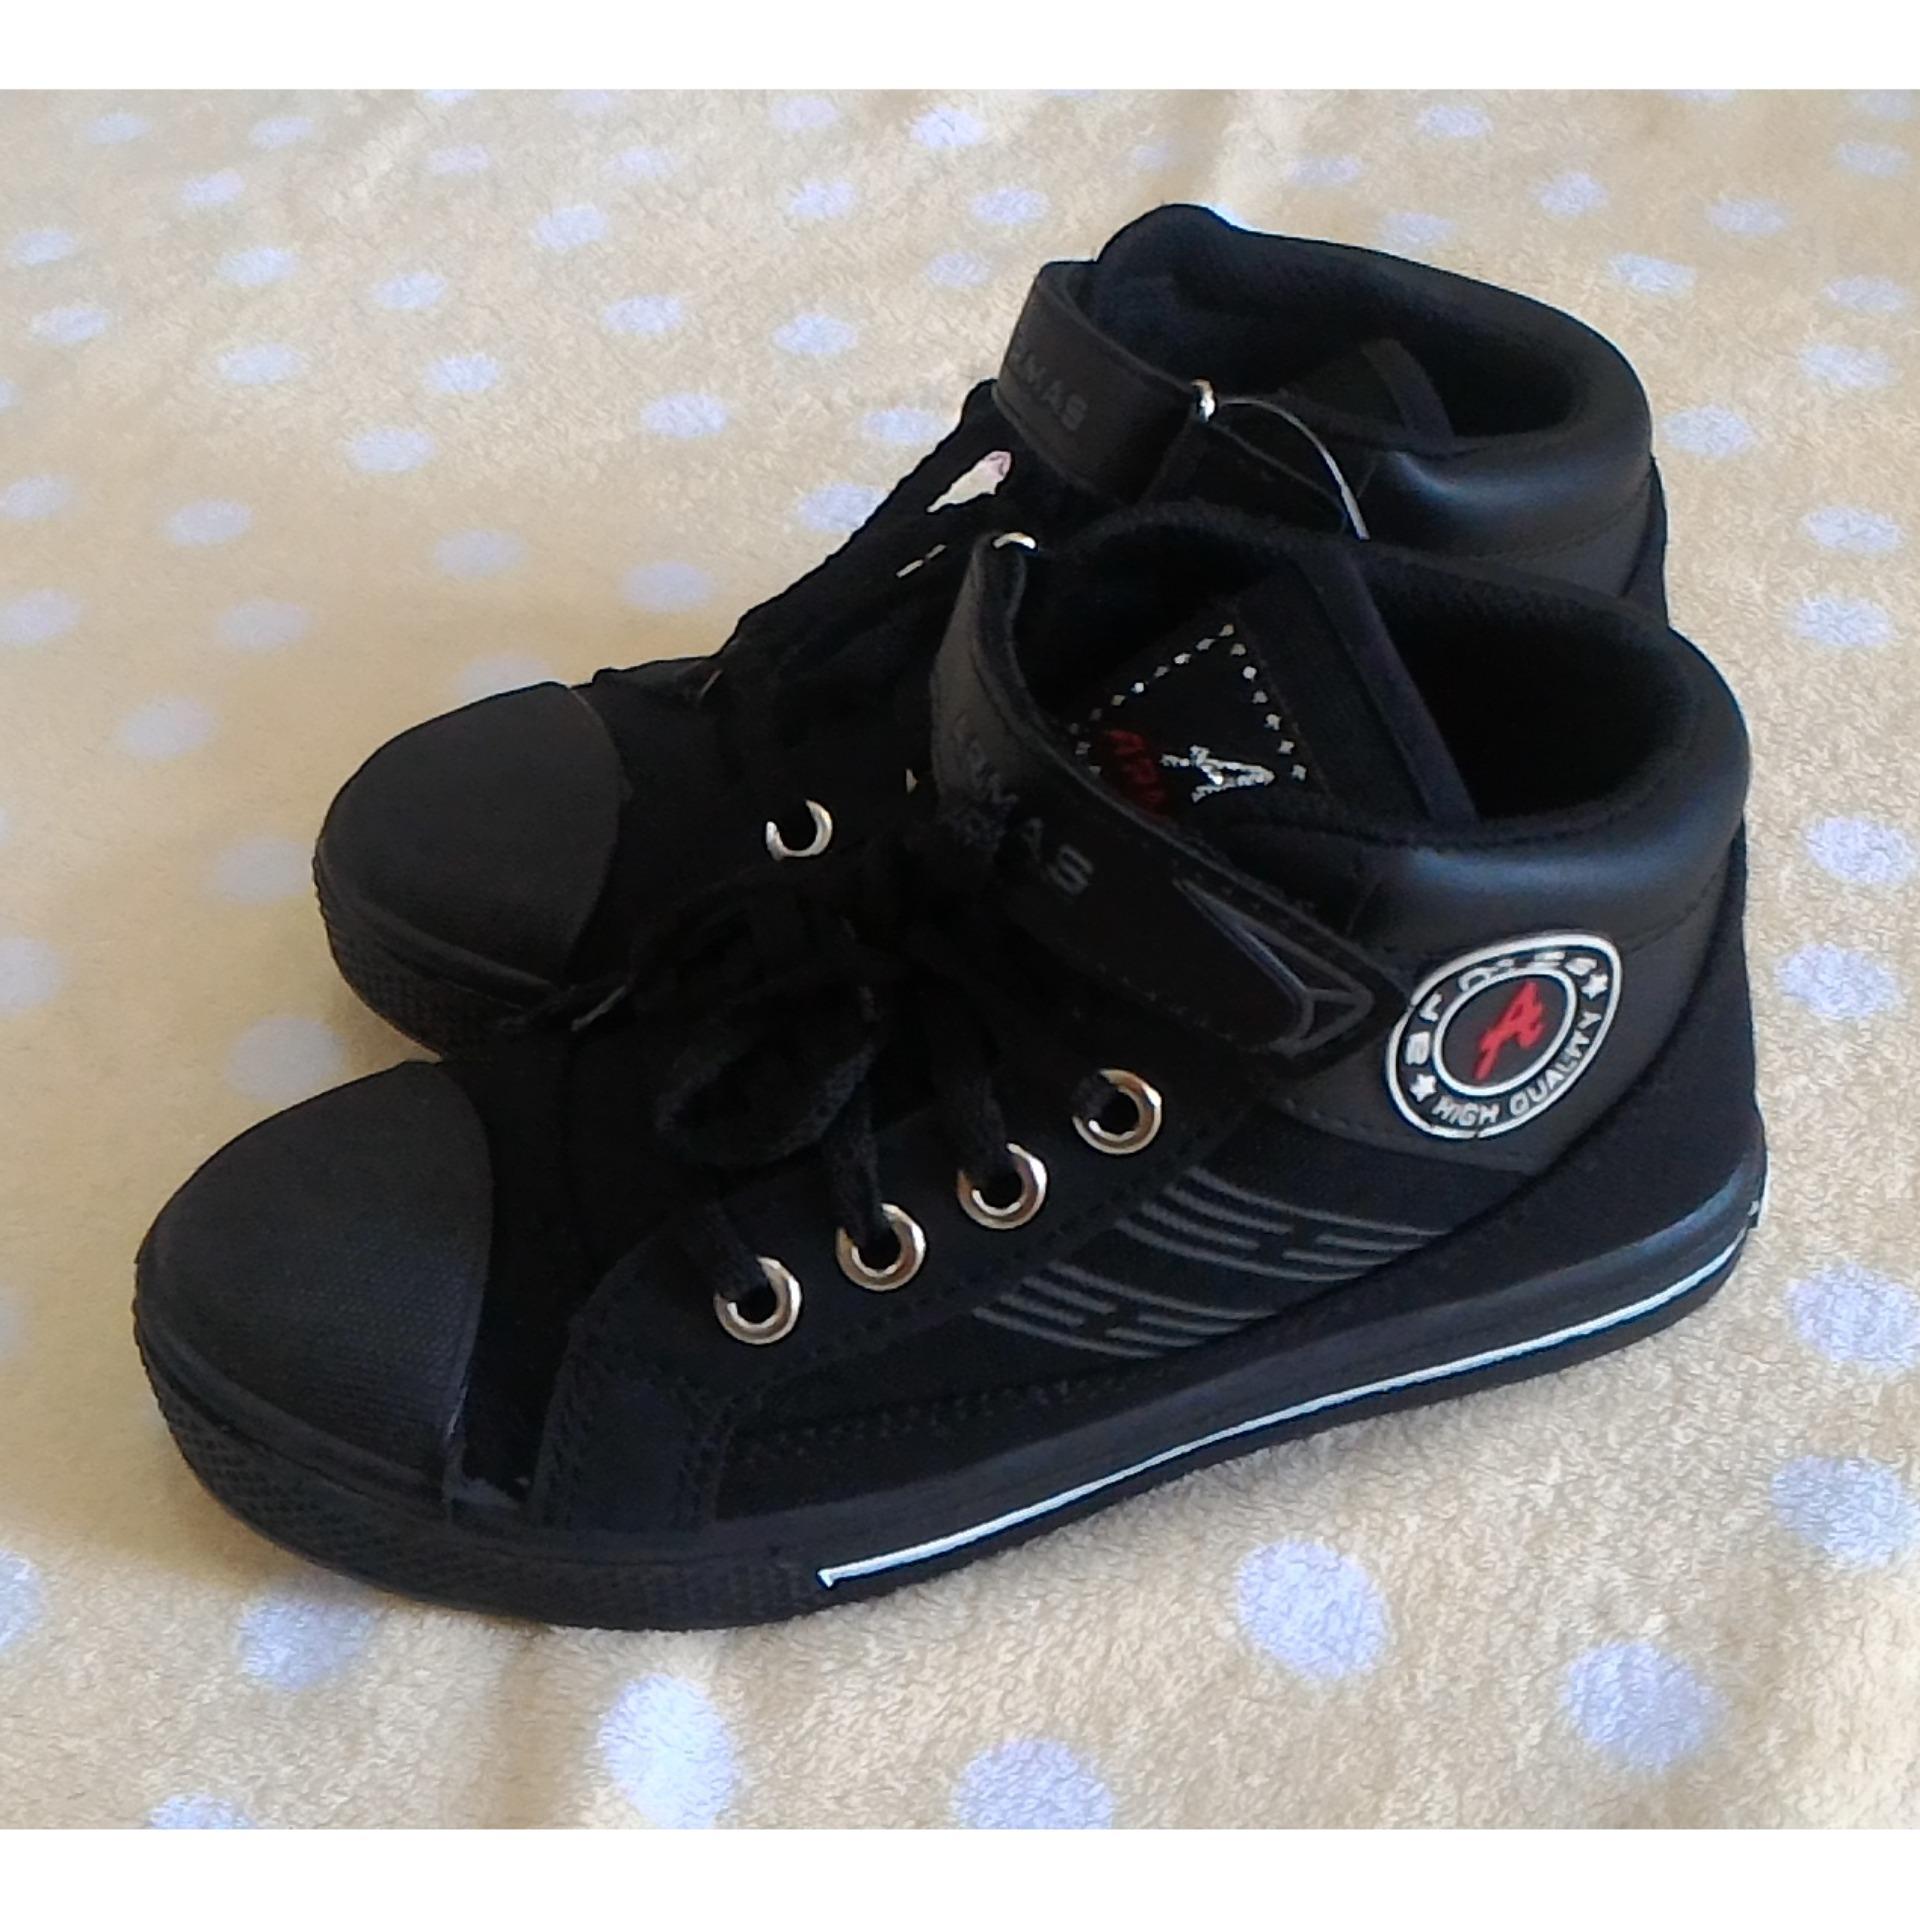 Sepatu Anak Laki-laki Terbaik | Lazada.co.id